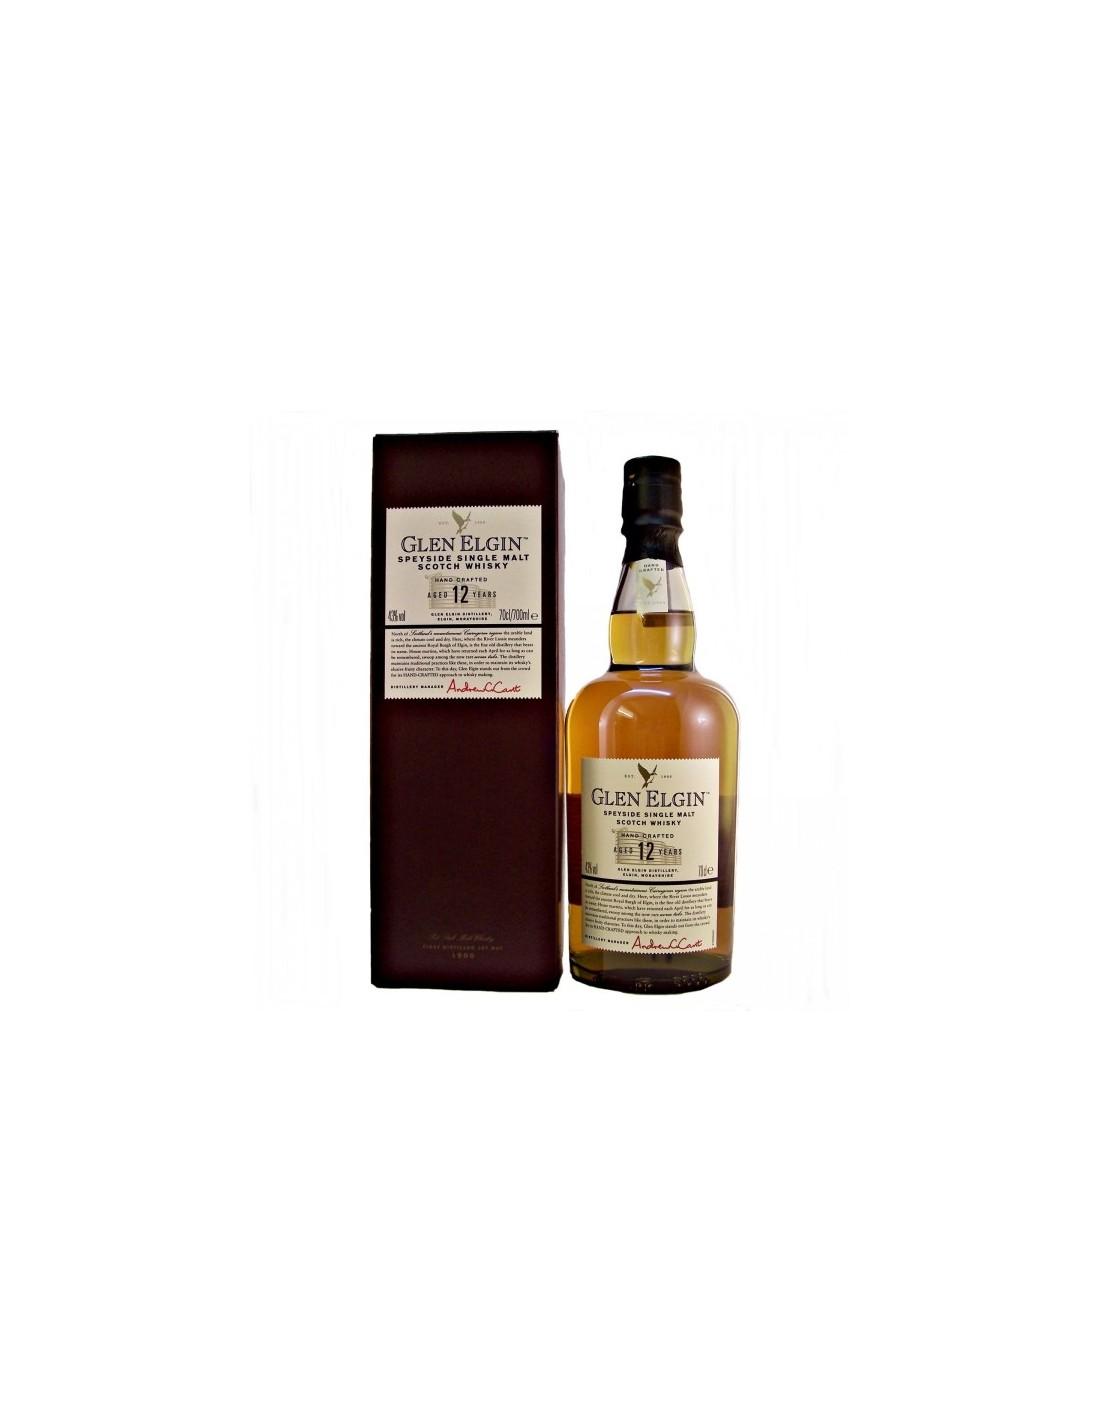 Whisky Glen Elgin, 12 ani, 43% alc., 0.7L, Scotia